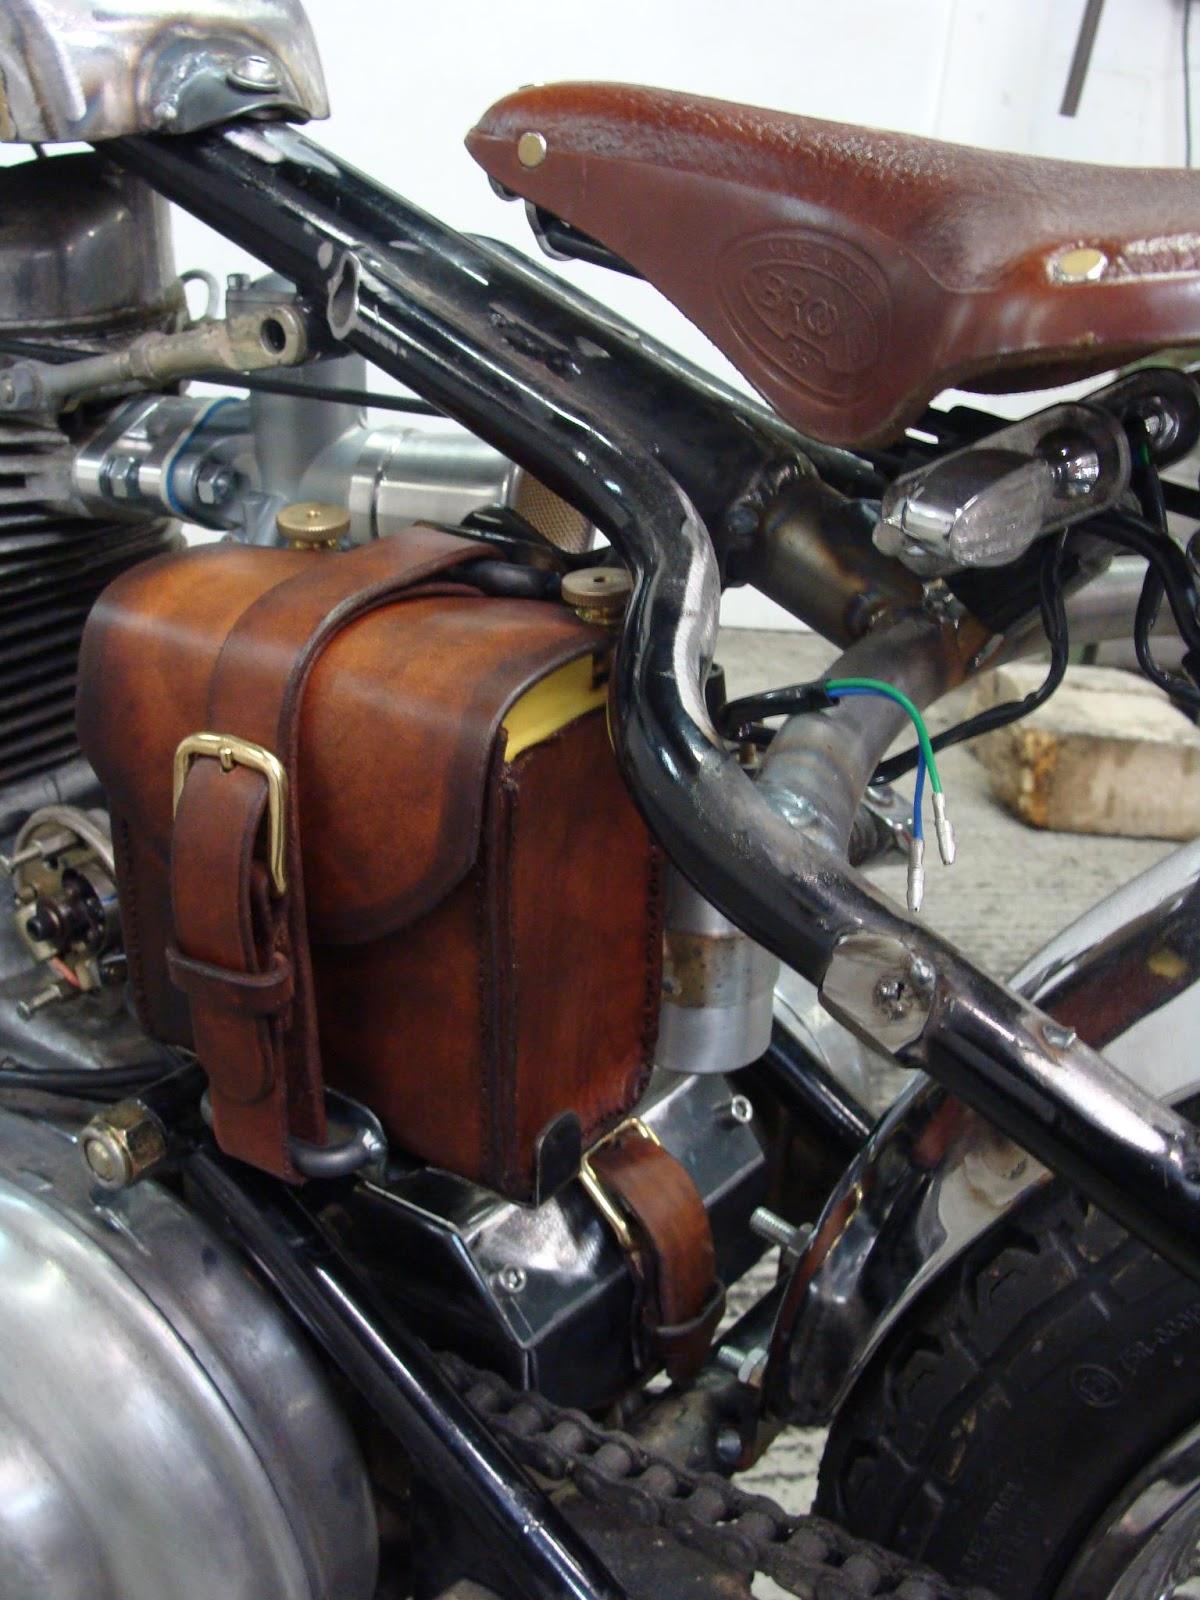 Suzuki Savage Custom Tool Bag Cover